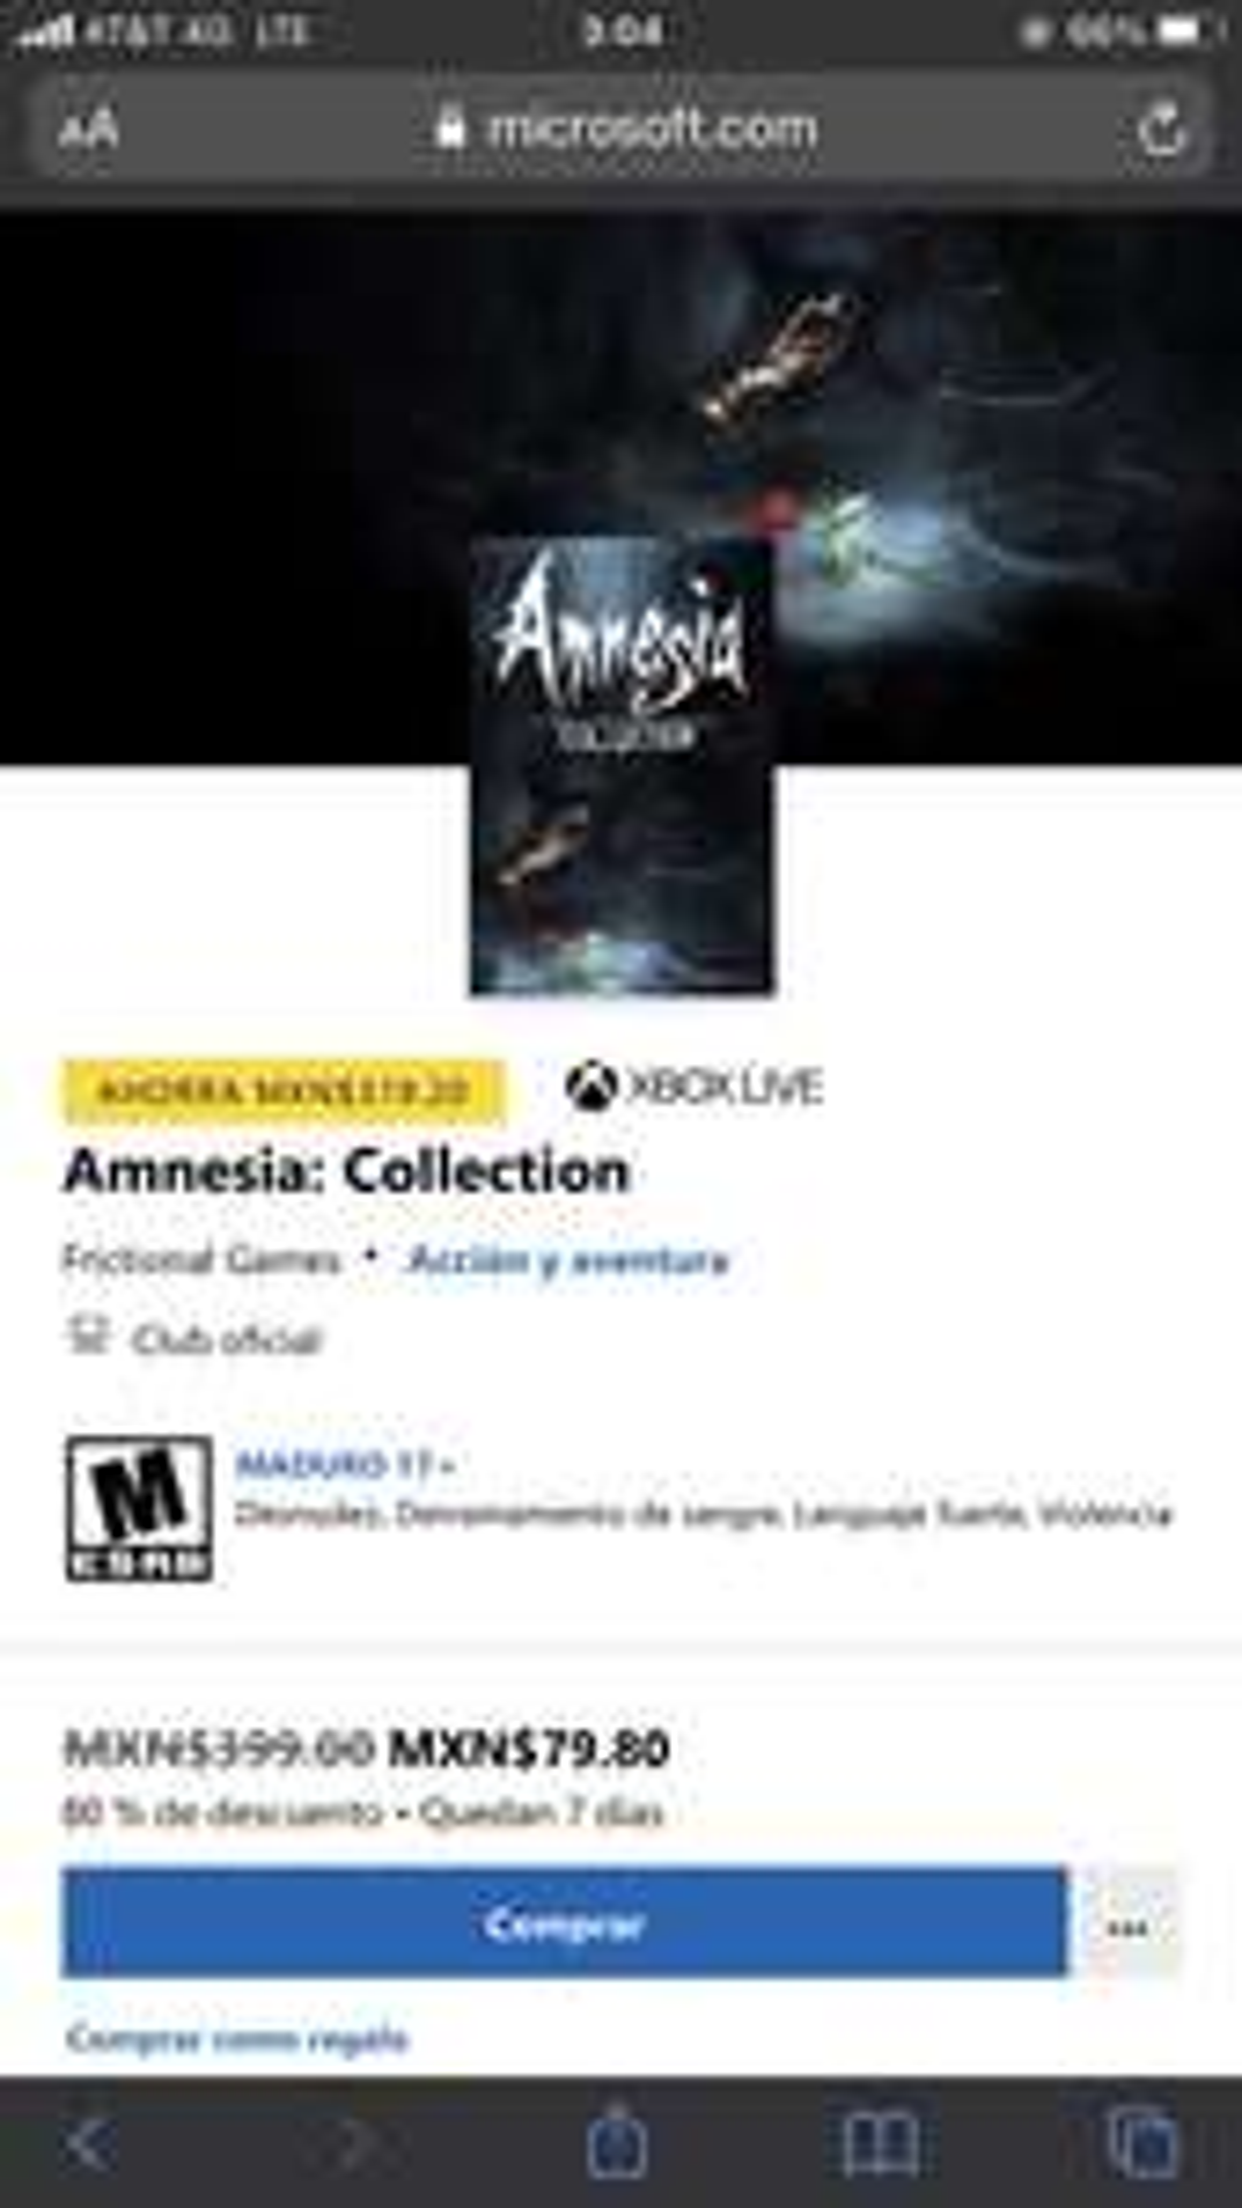 Xbox, Bundle Amnesia: Collection Xbox One/Series X|S